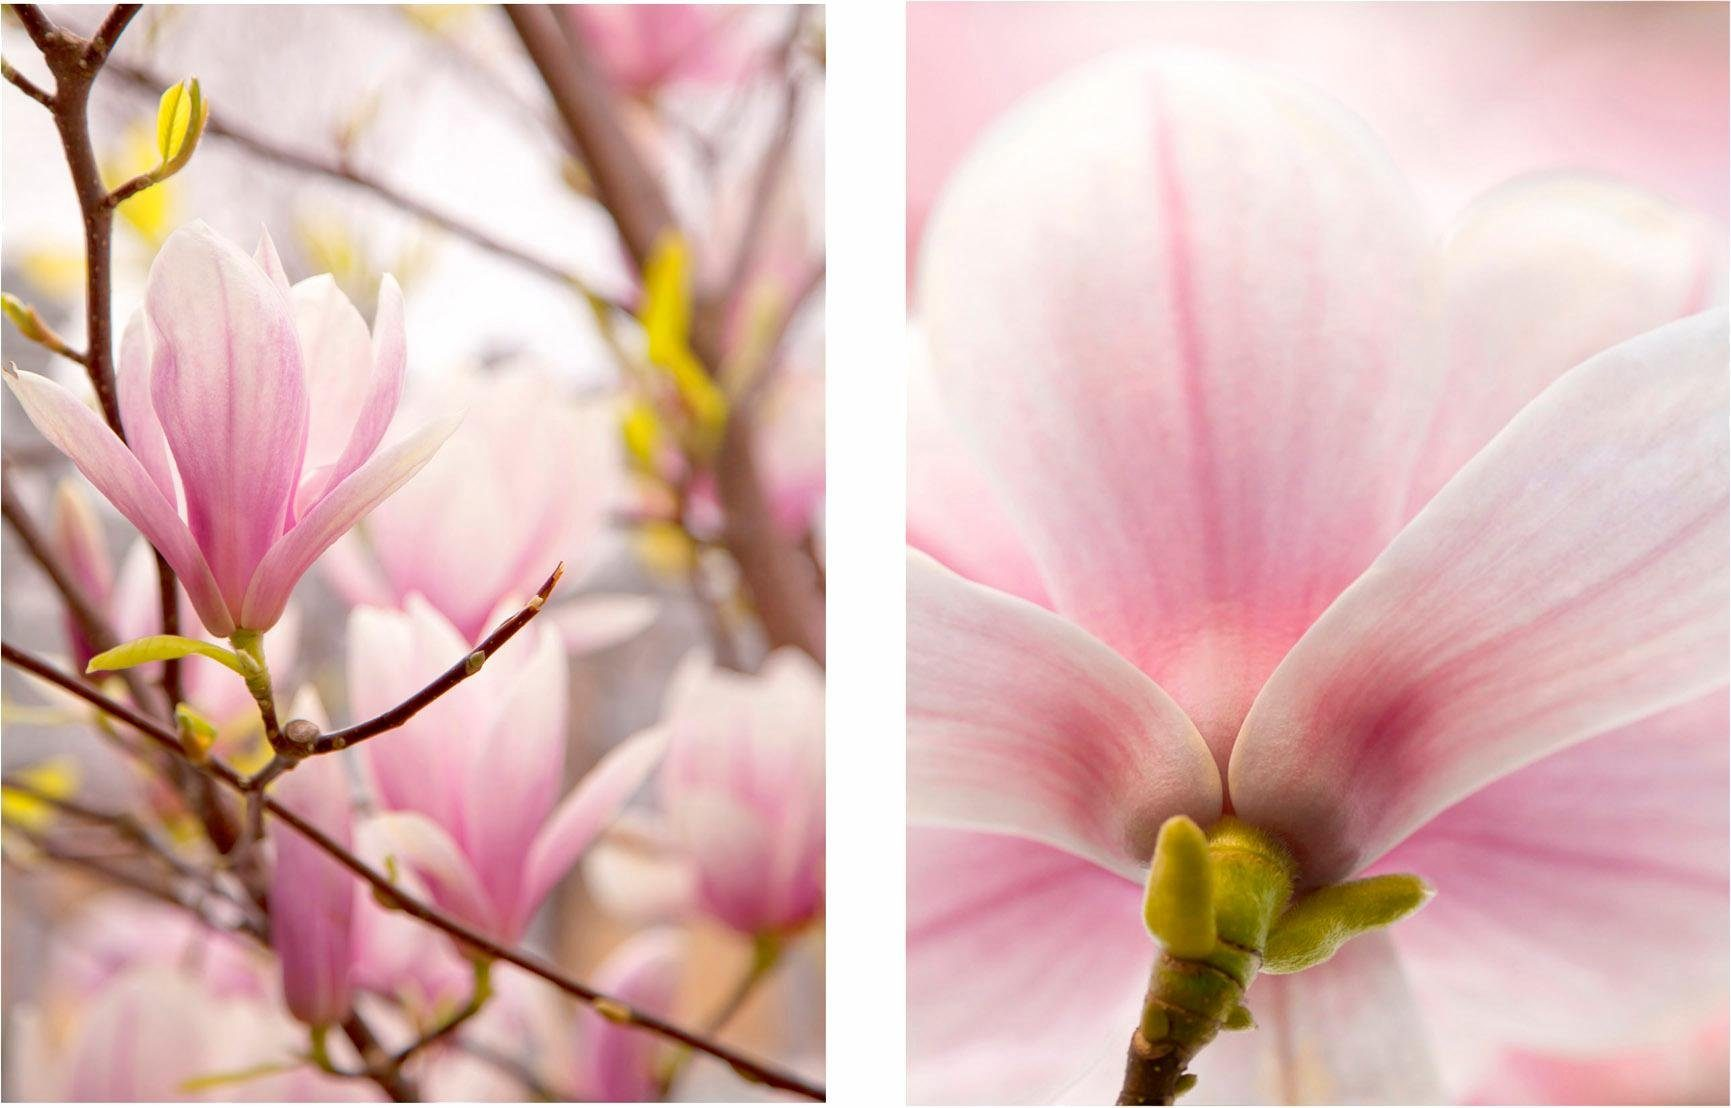 Home affaire Bild »Magnolien«, (Set), 2er Set